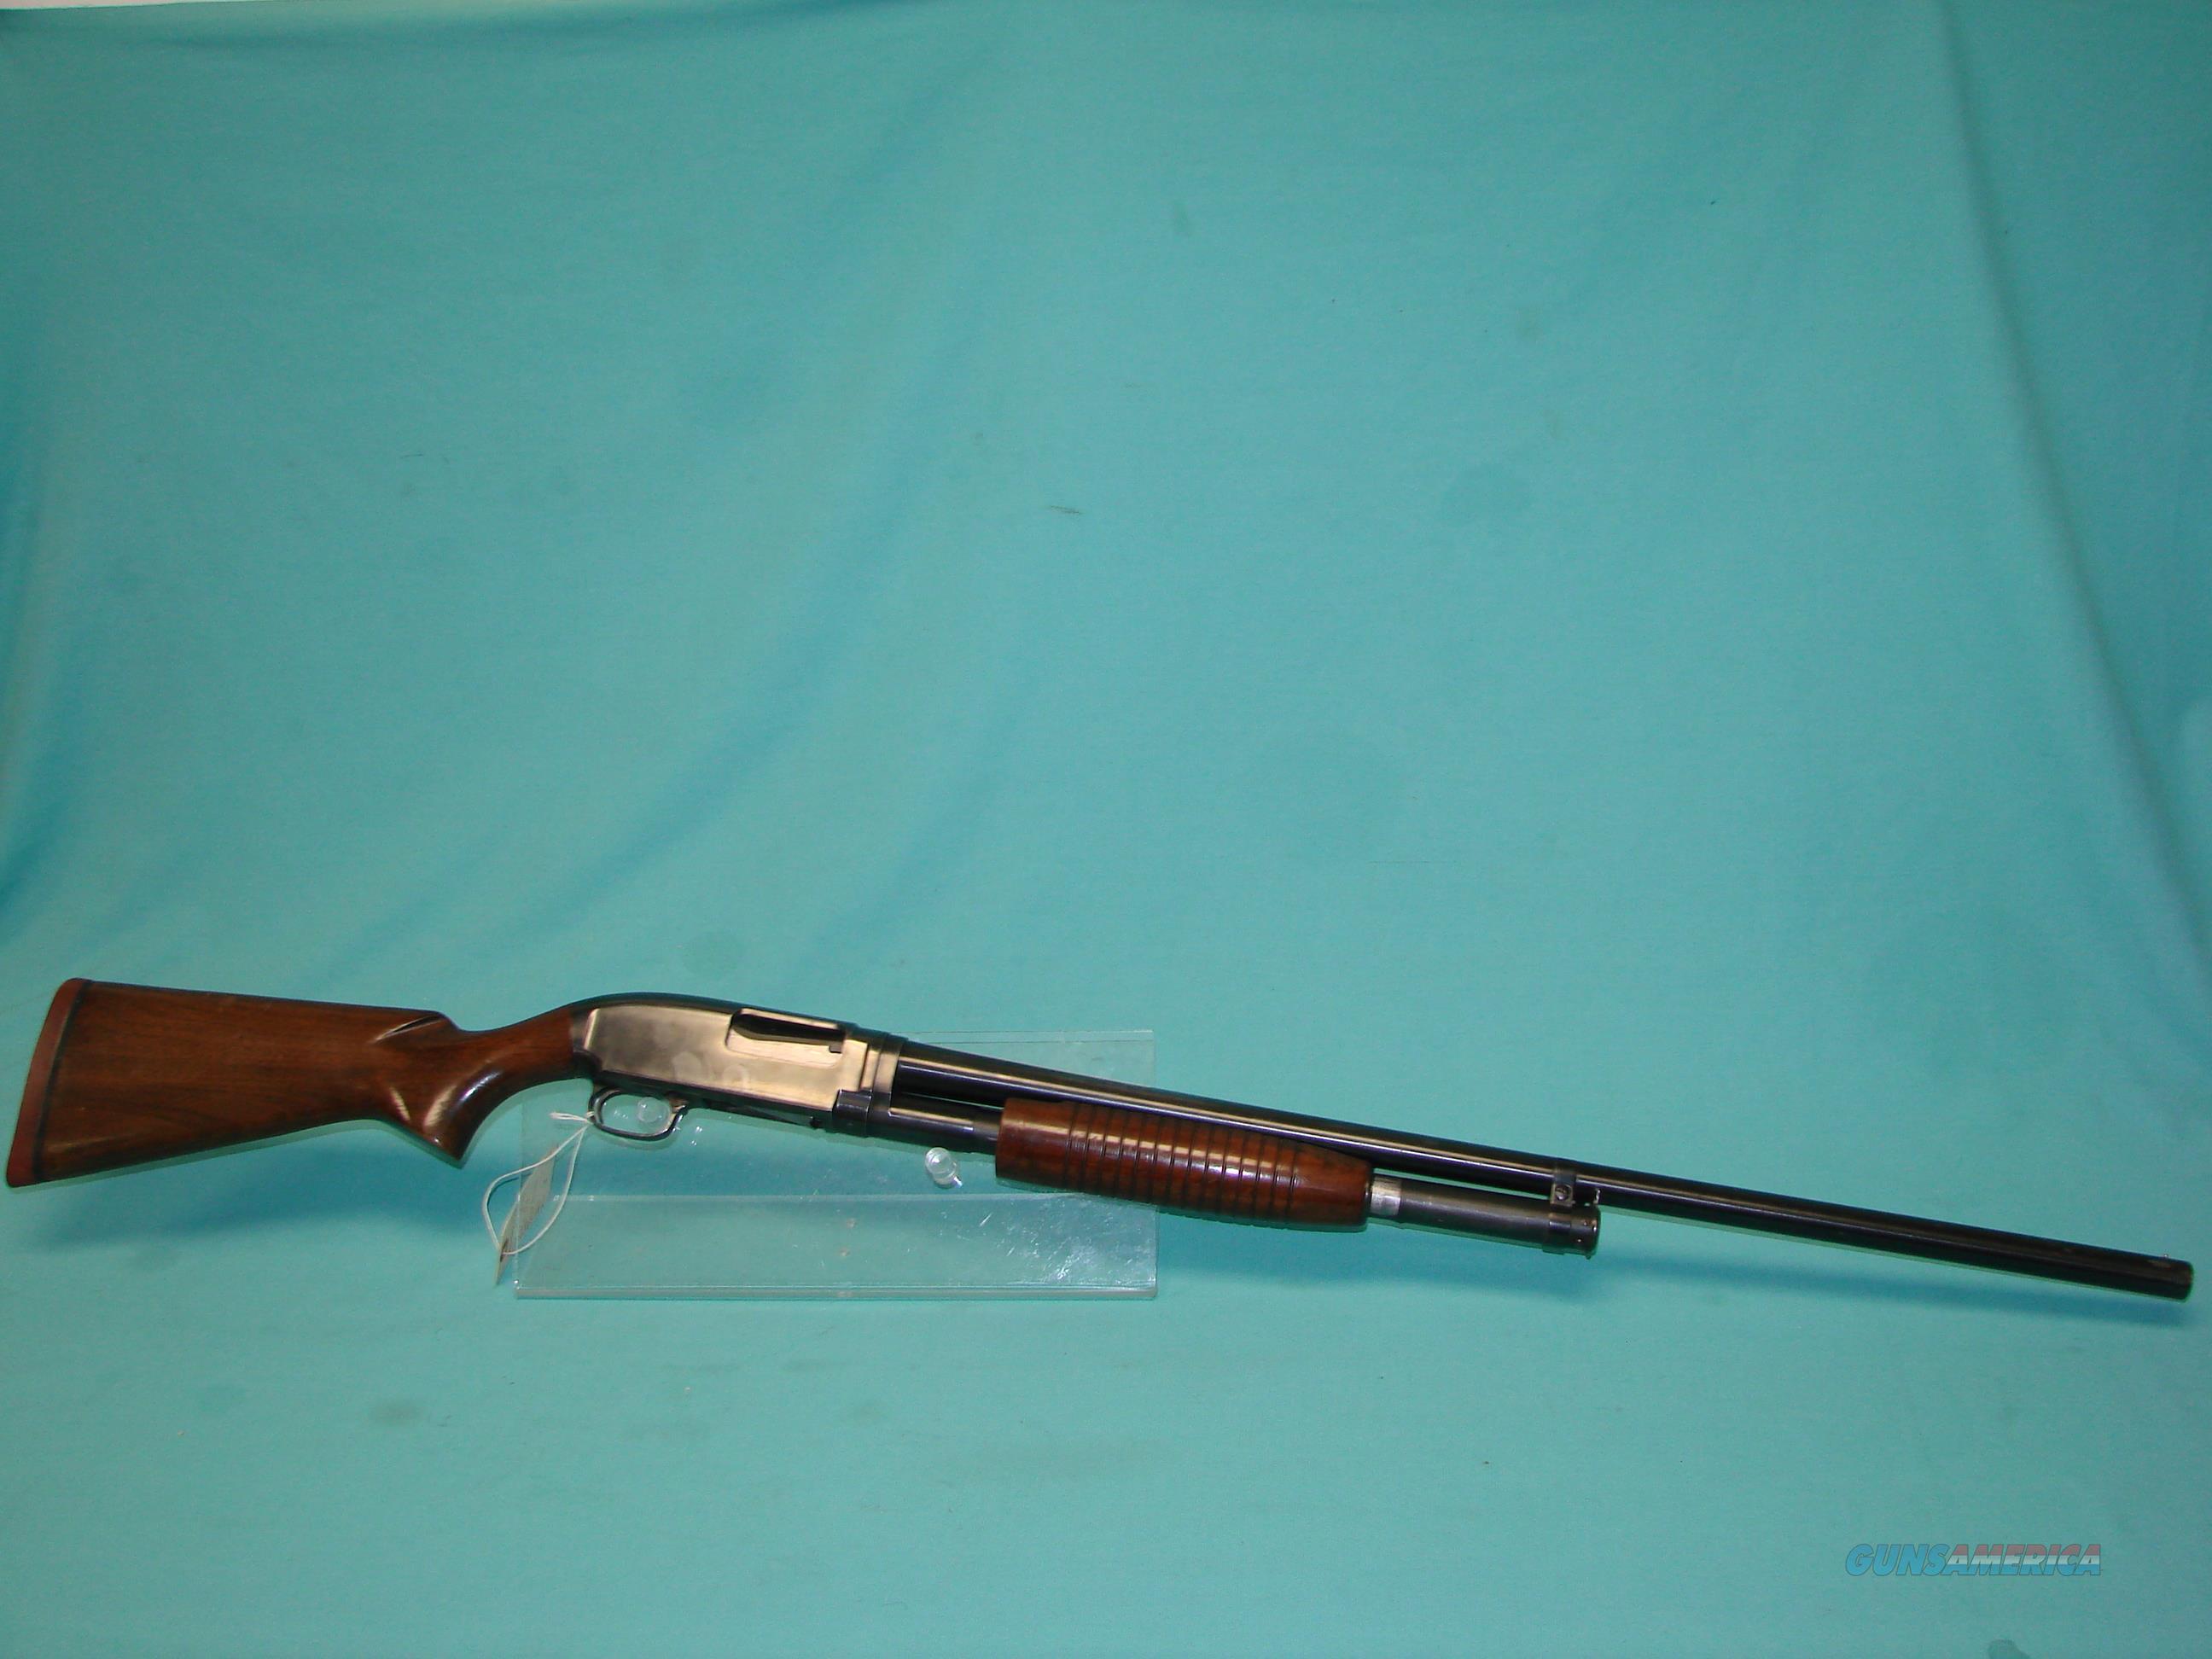 Winchester 12  Guns > Shotguns > Winchester Shotguns - Modern > Pump Action > Hunting